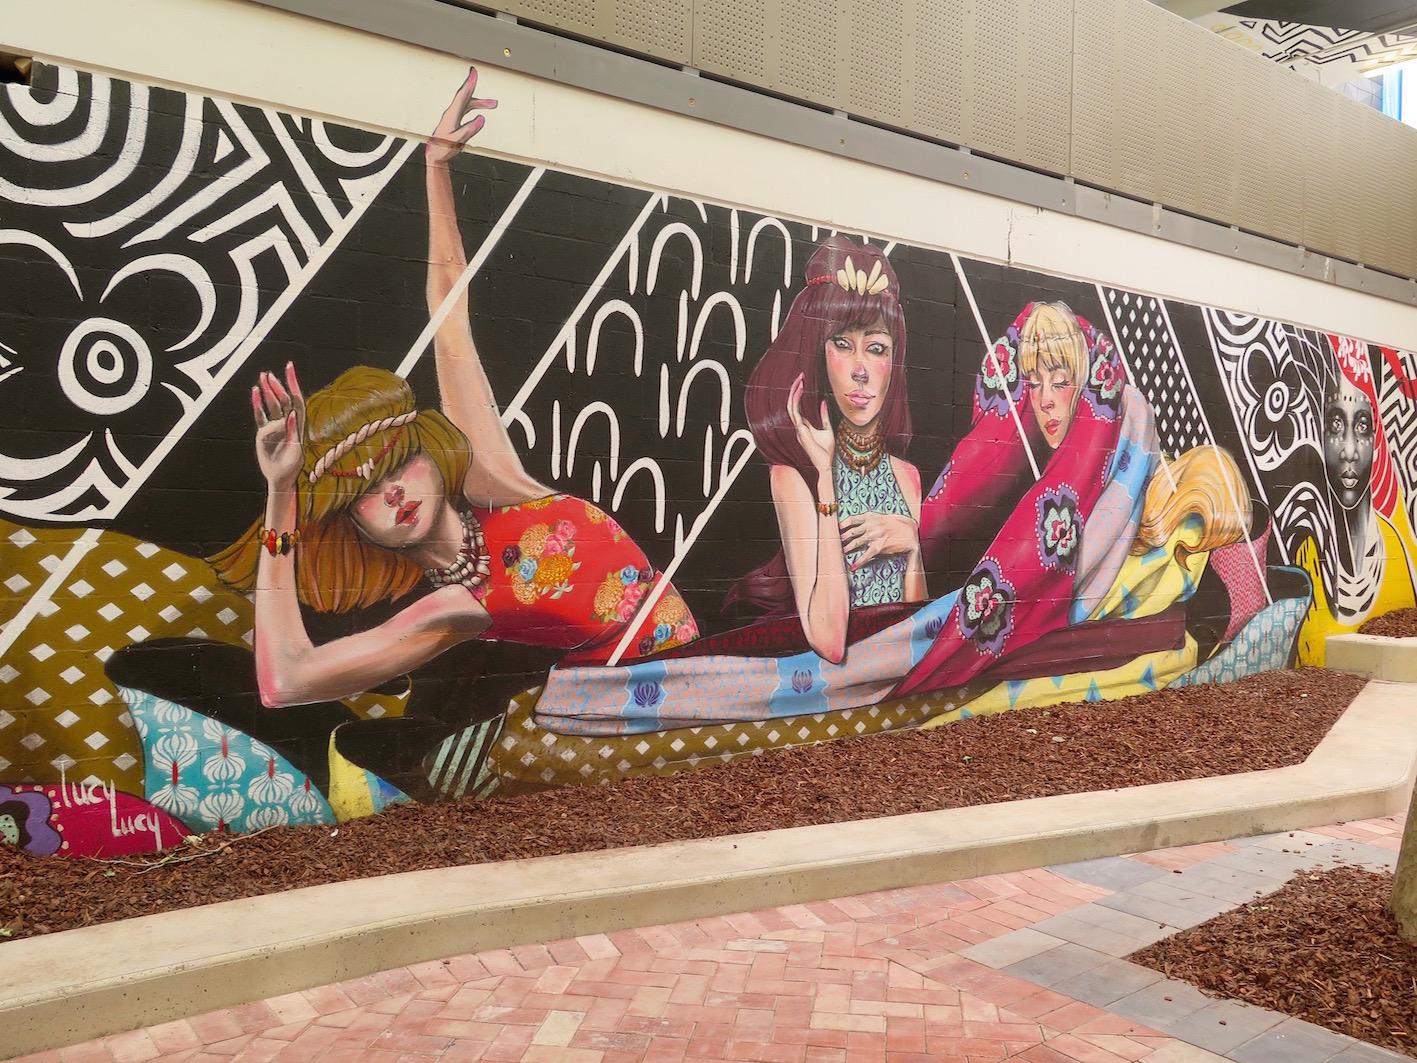 deansunshine_landofsunshine_melbourne_streetart_graffiti_eastland urban art project 7 lucy lucy shannons crees collab 3